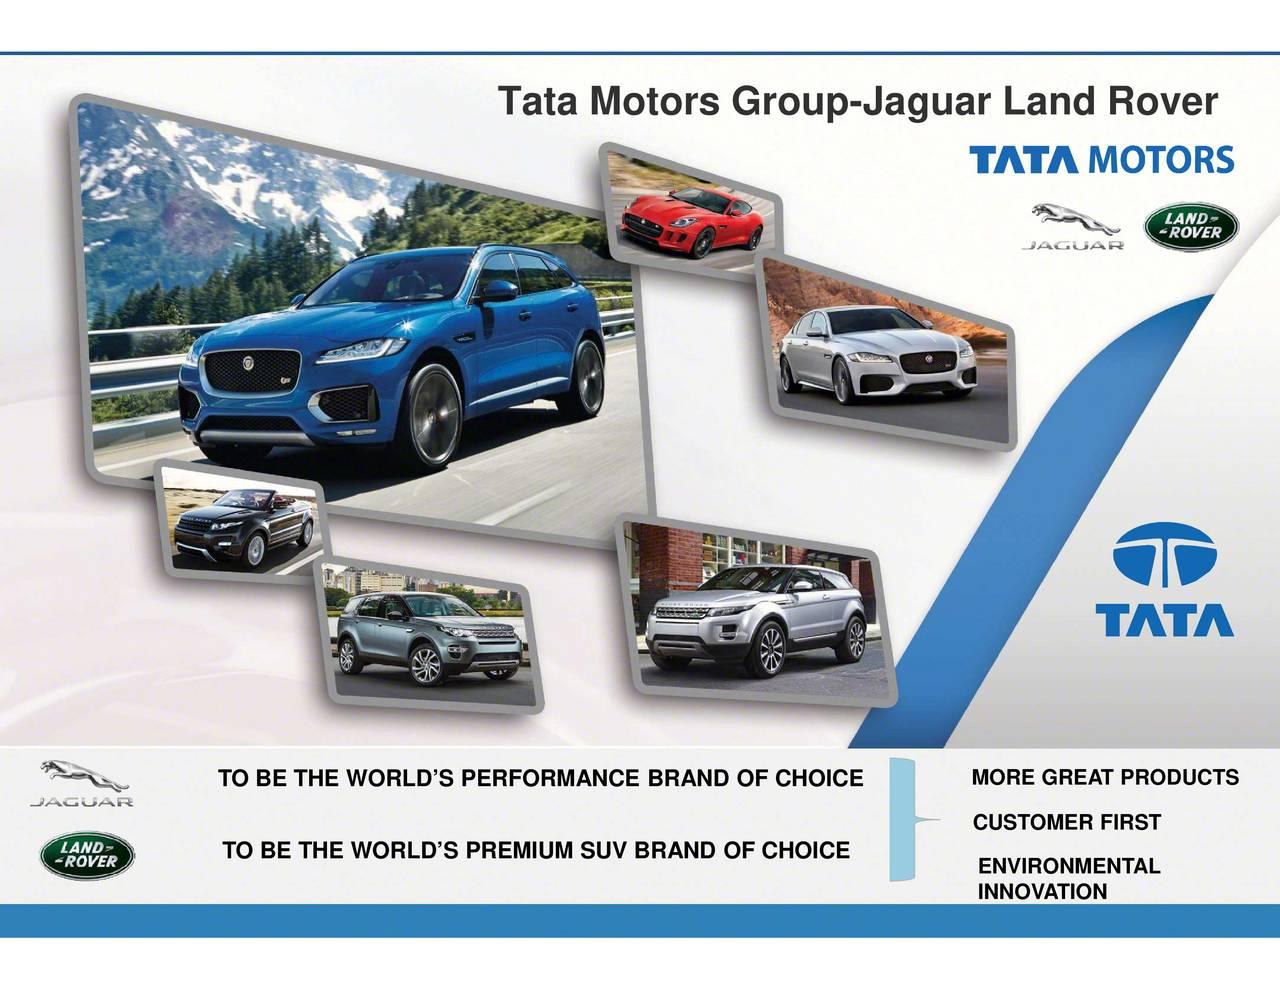 product mix of tata motors The brand image goes far beyond the functional characteristics of the product the products of tata motors have many special ratan n tata marketing mix.